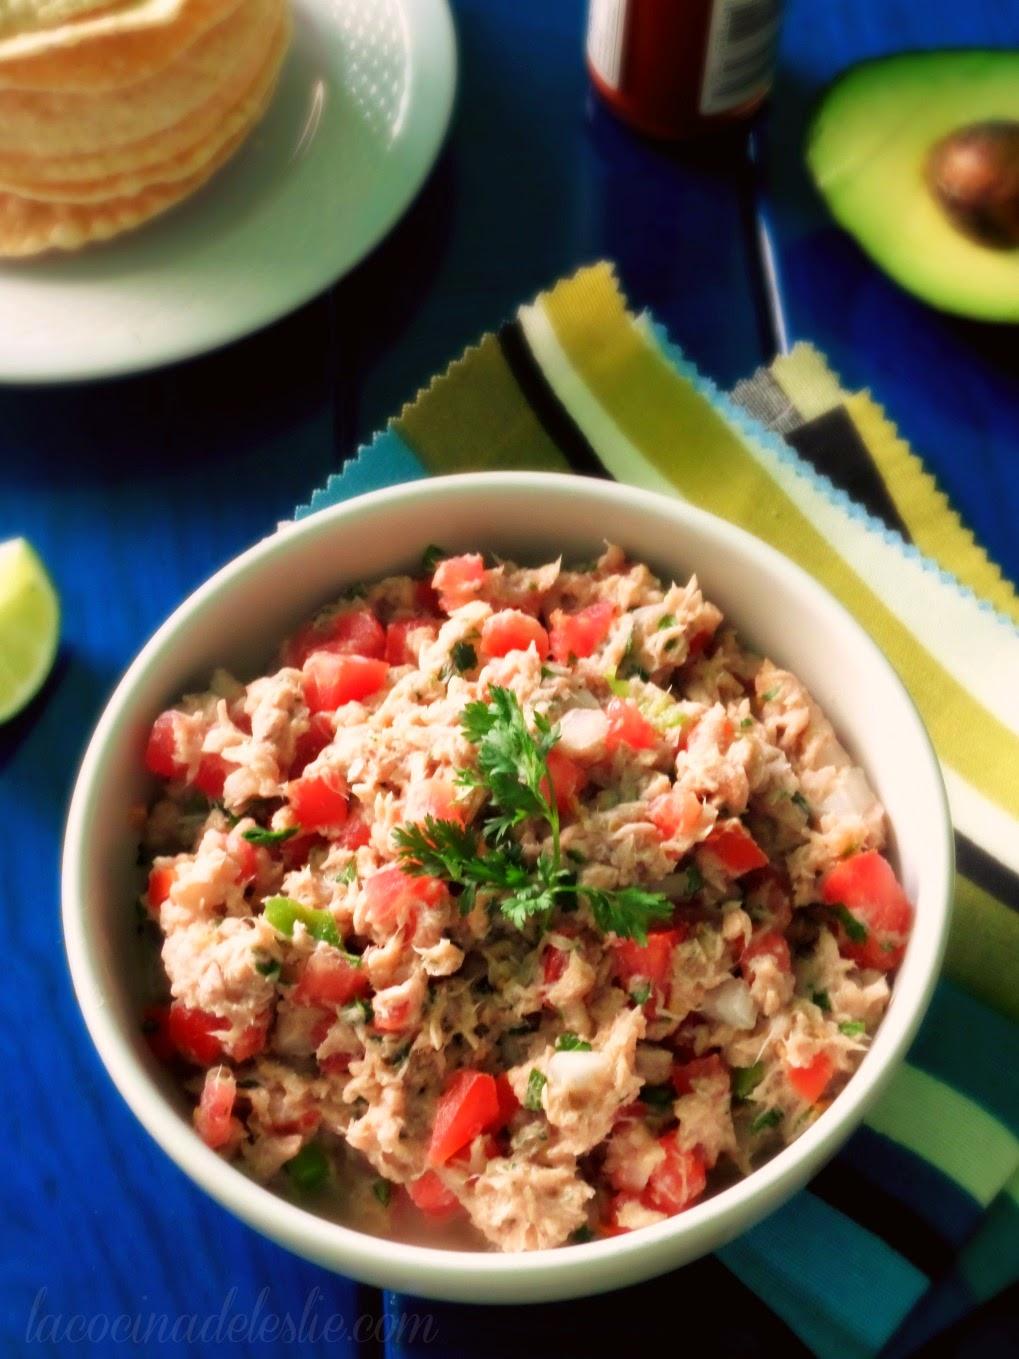 Ceviche de Atún (Tuna Ceviche) - lacocinadeleslie.com